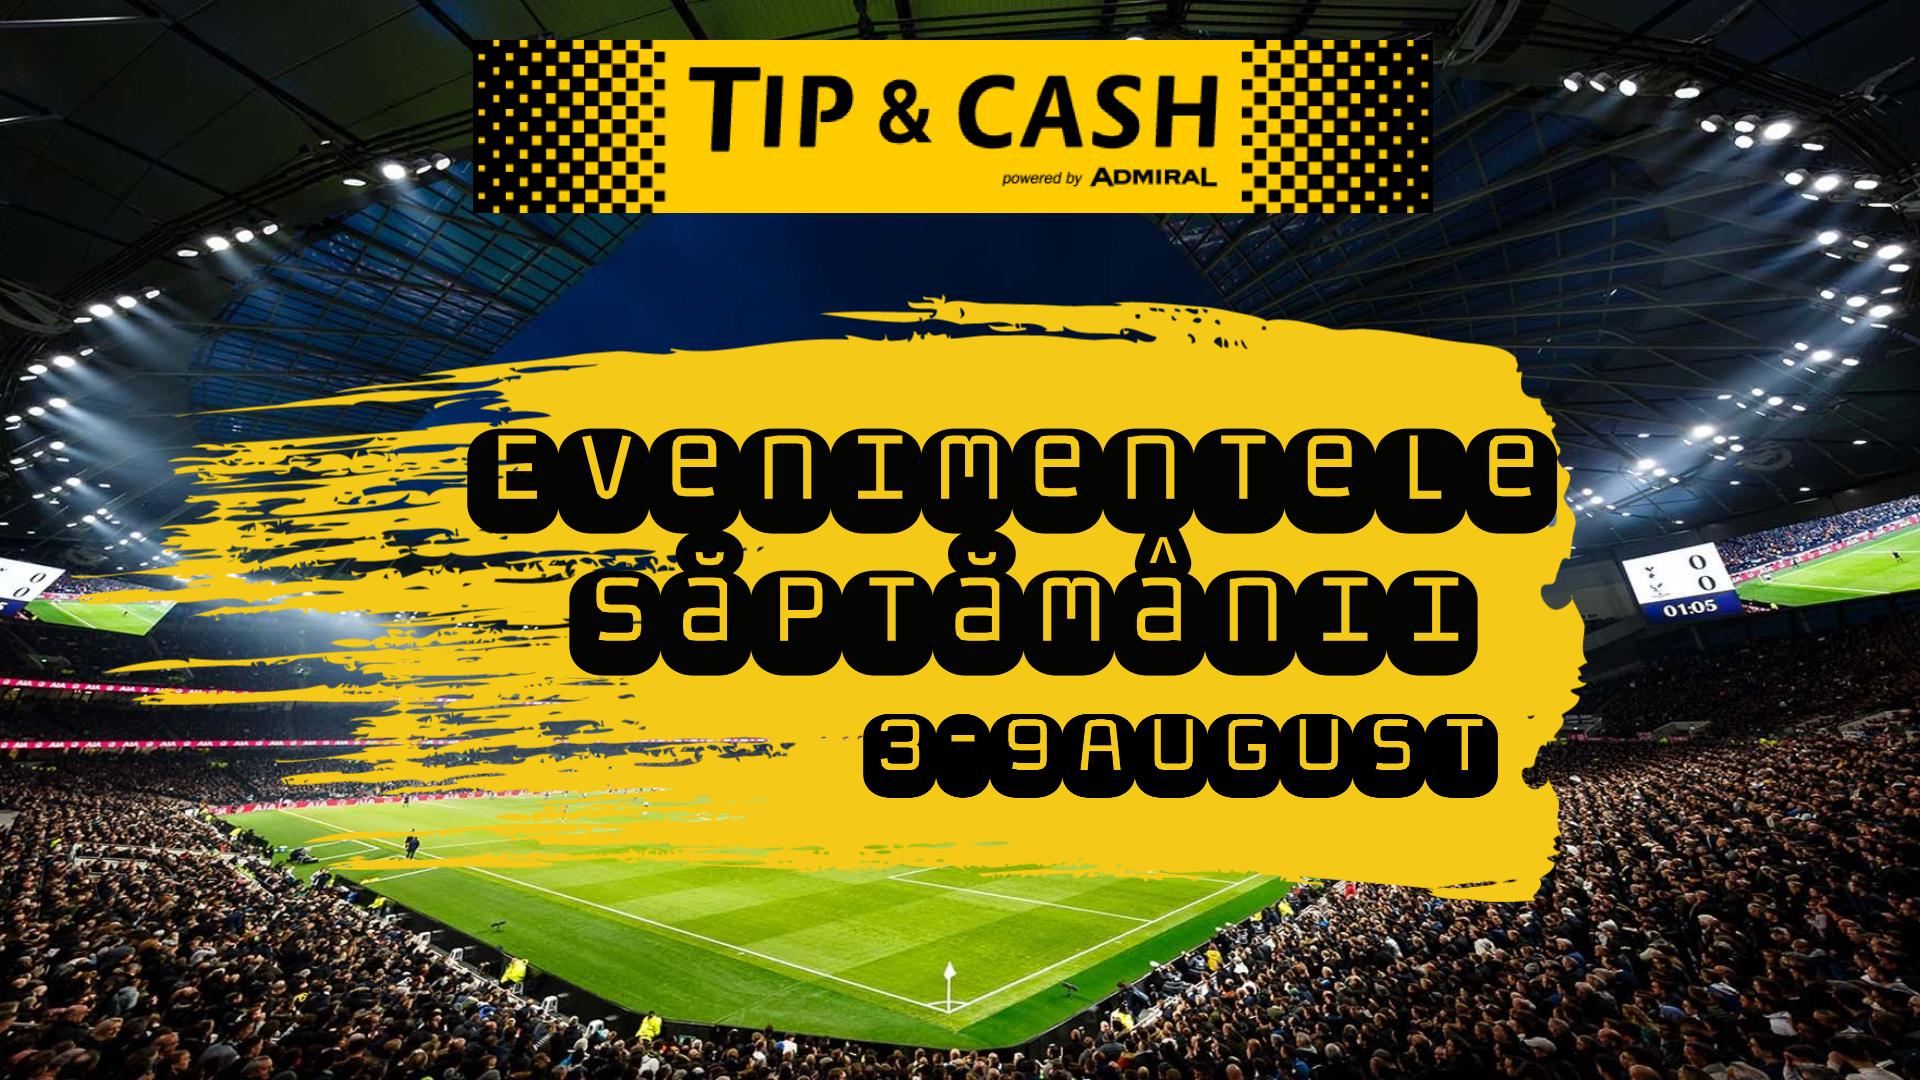 TIP&CASH evenimente 3-5 august 2020